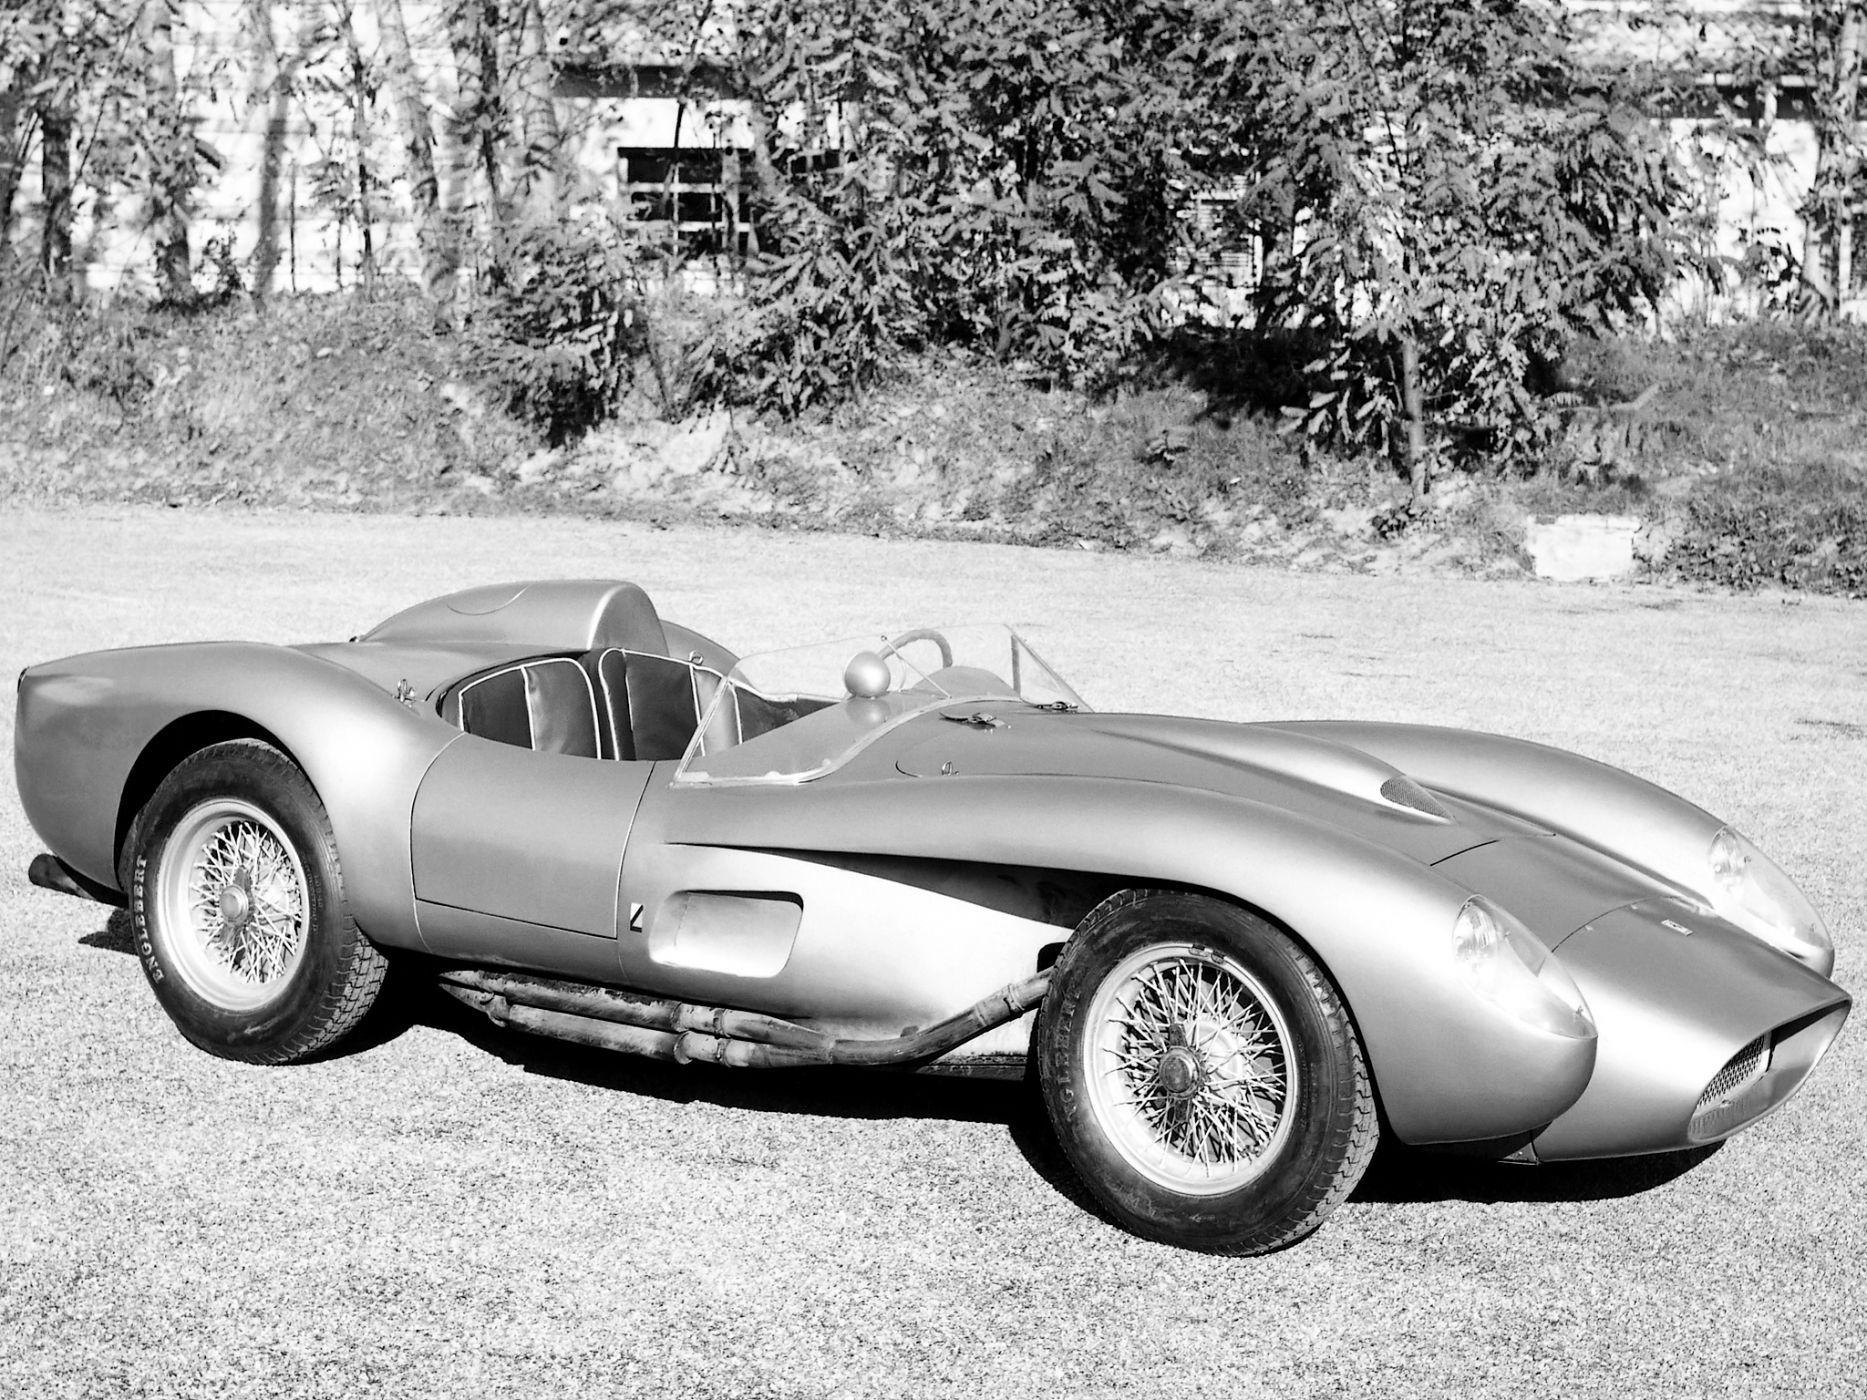 1957 Ferrari 250 Testa Rossa Scaglietti Spyder Supercar Retro Race Racing G Wallpaper Ferrari Car Ferrari Super Cars